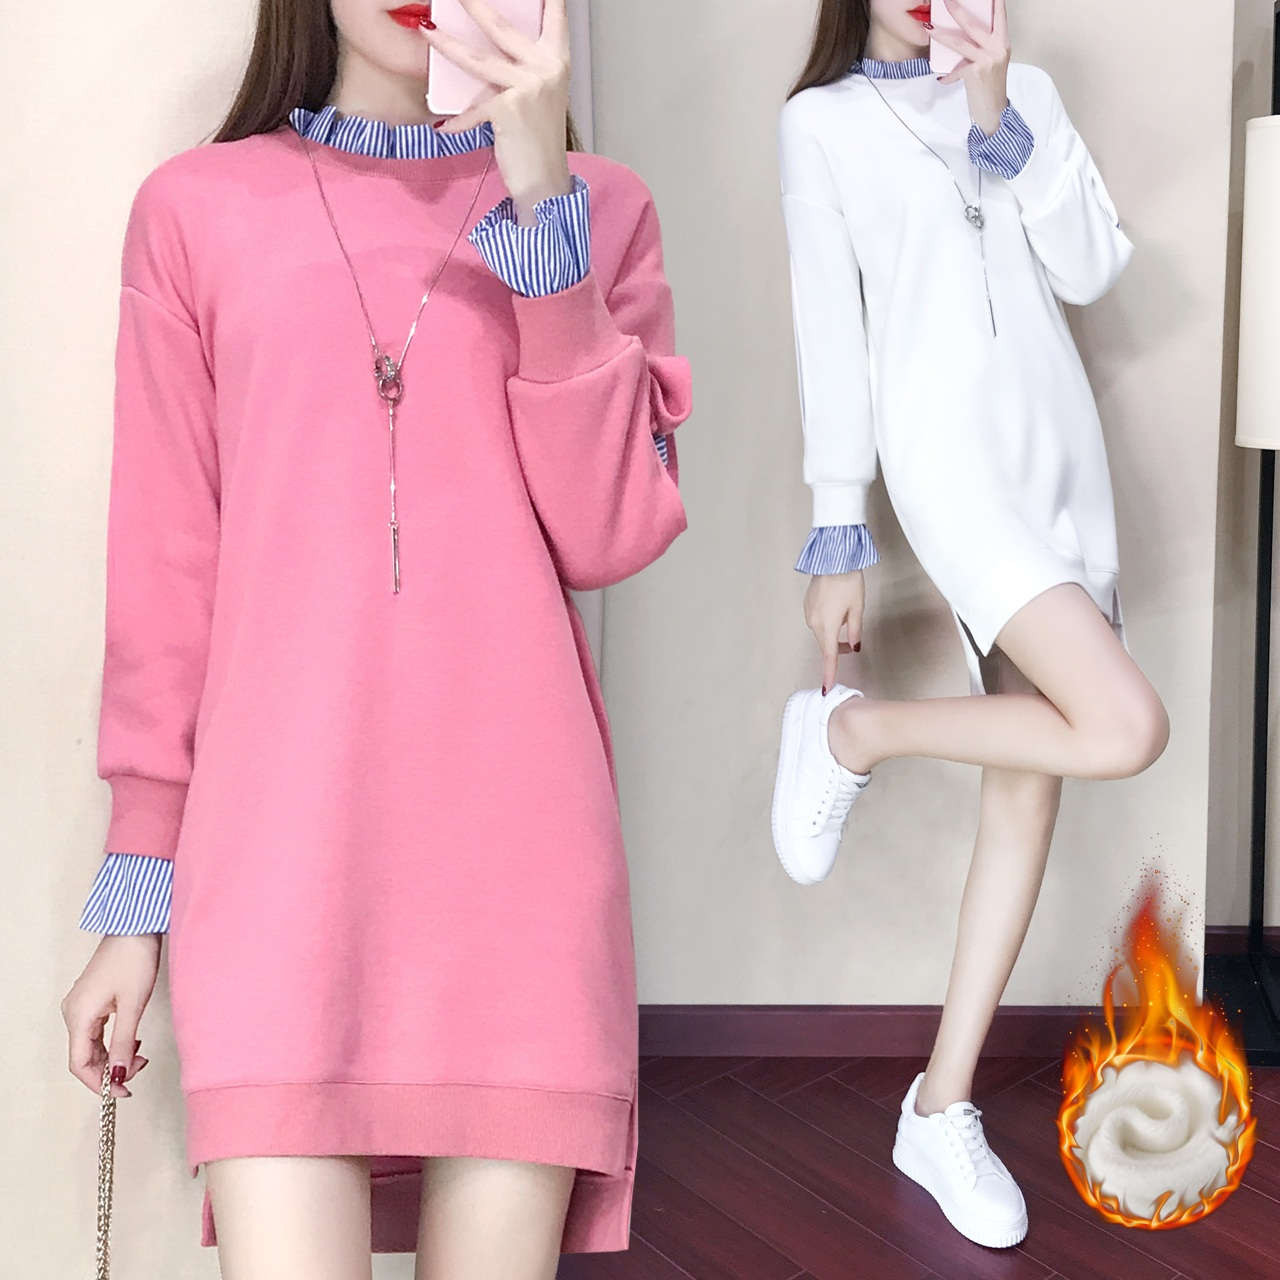 韩版加绒时尚气质假两件<font color='red'><b>连衣裙</b></font>